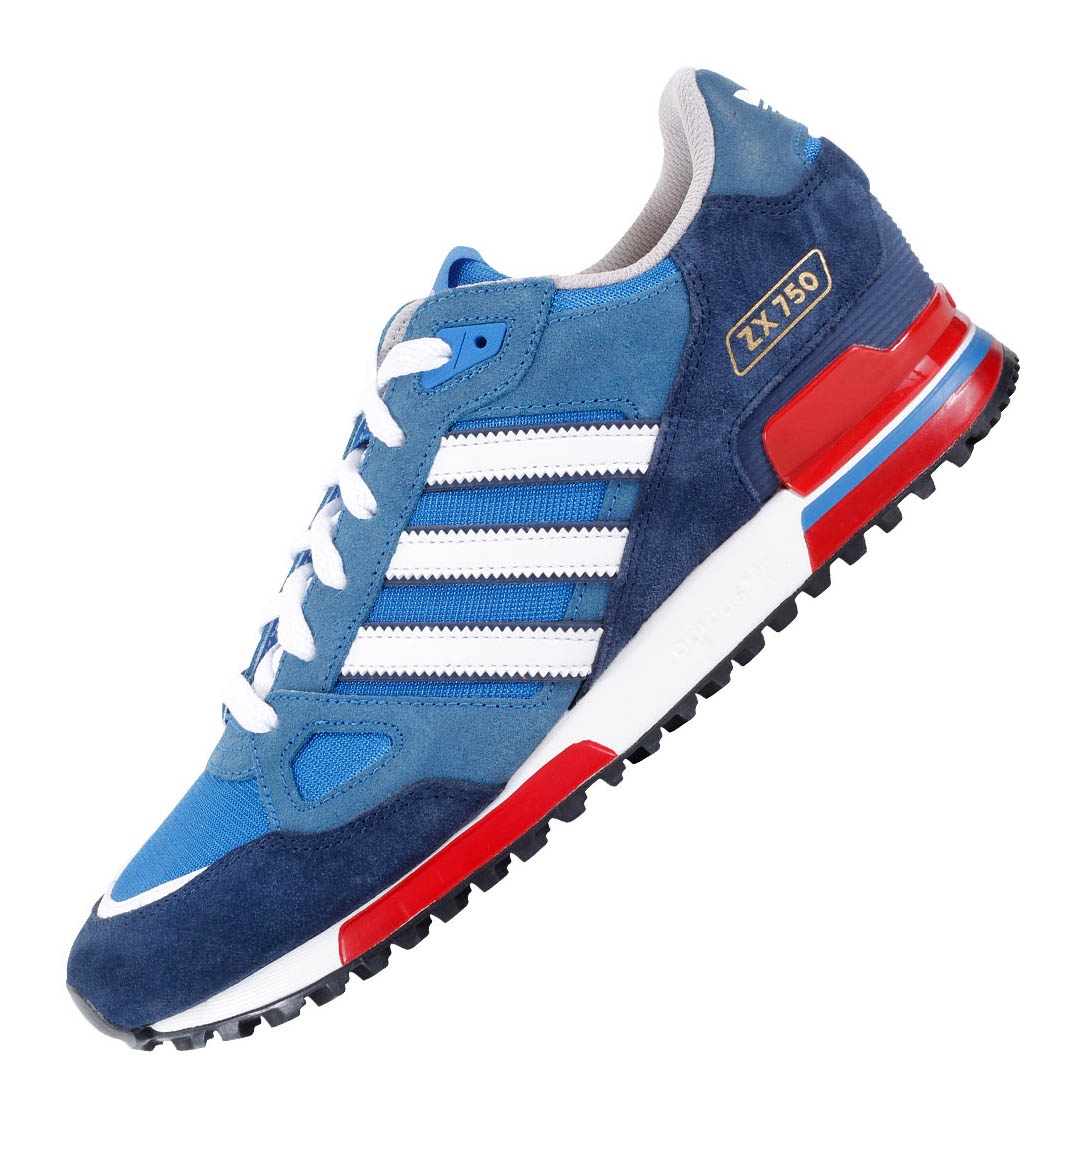 adidas zx750 blue